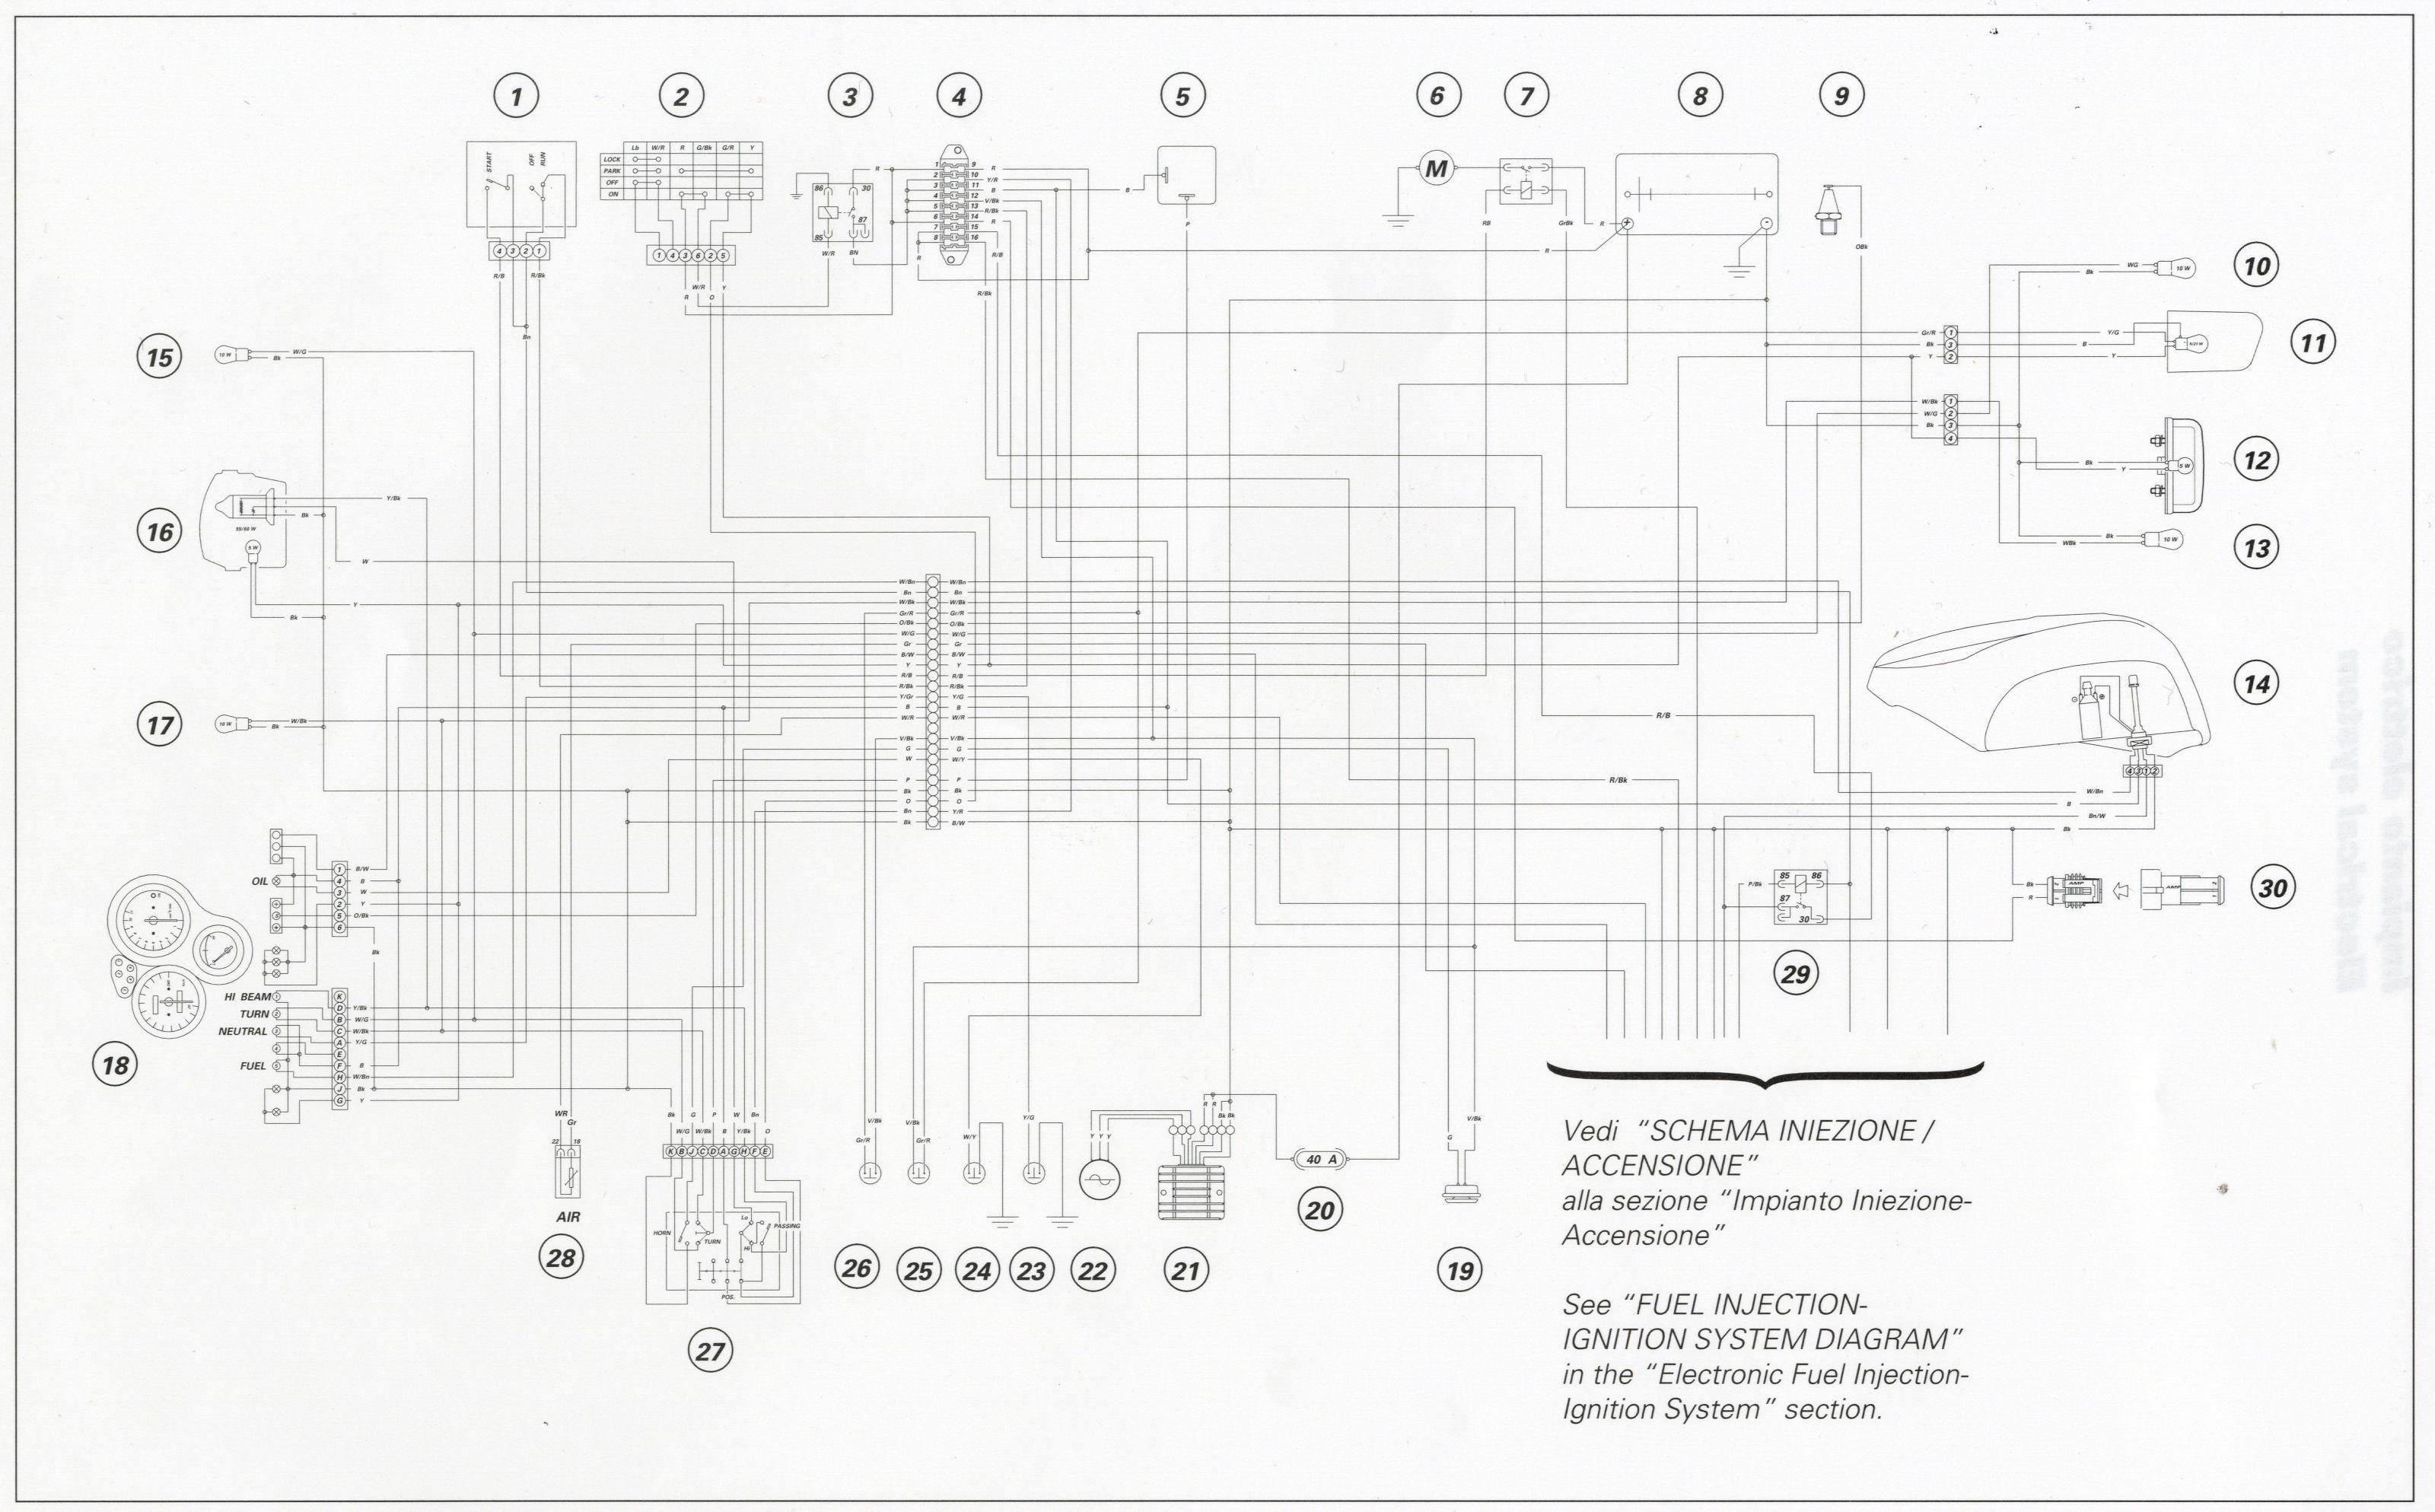 √ ducati 848 wiring diagram electrical schematic 2000 ducati Electrical Schematic Diagram 630-2810 ducati 999 wiring diagram voltage regulator wiring diagram